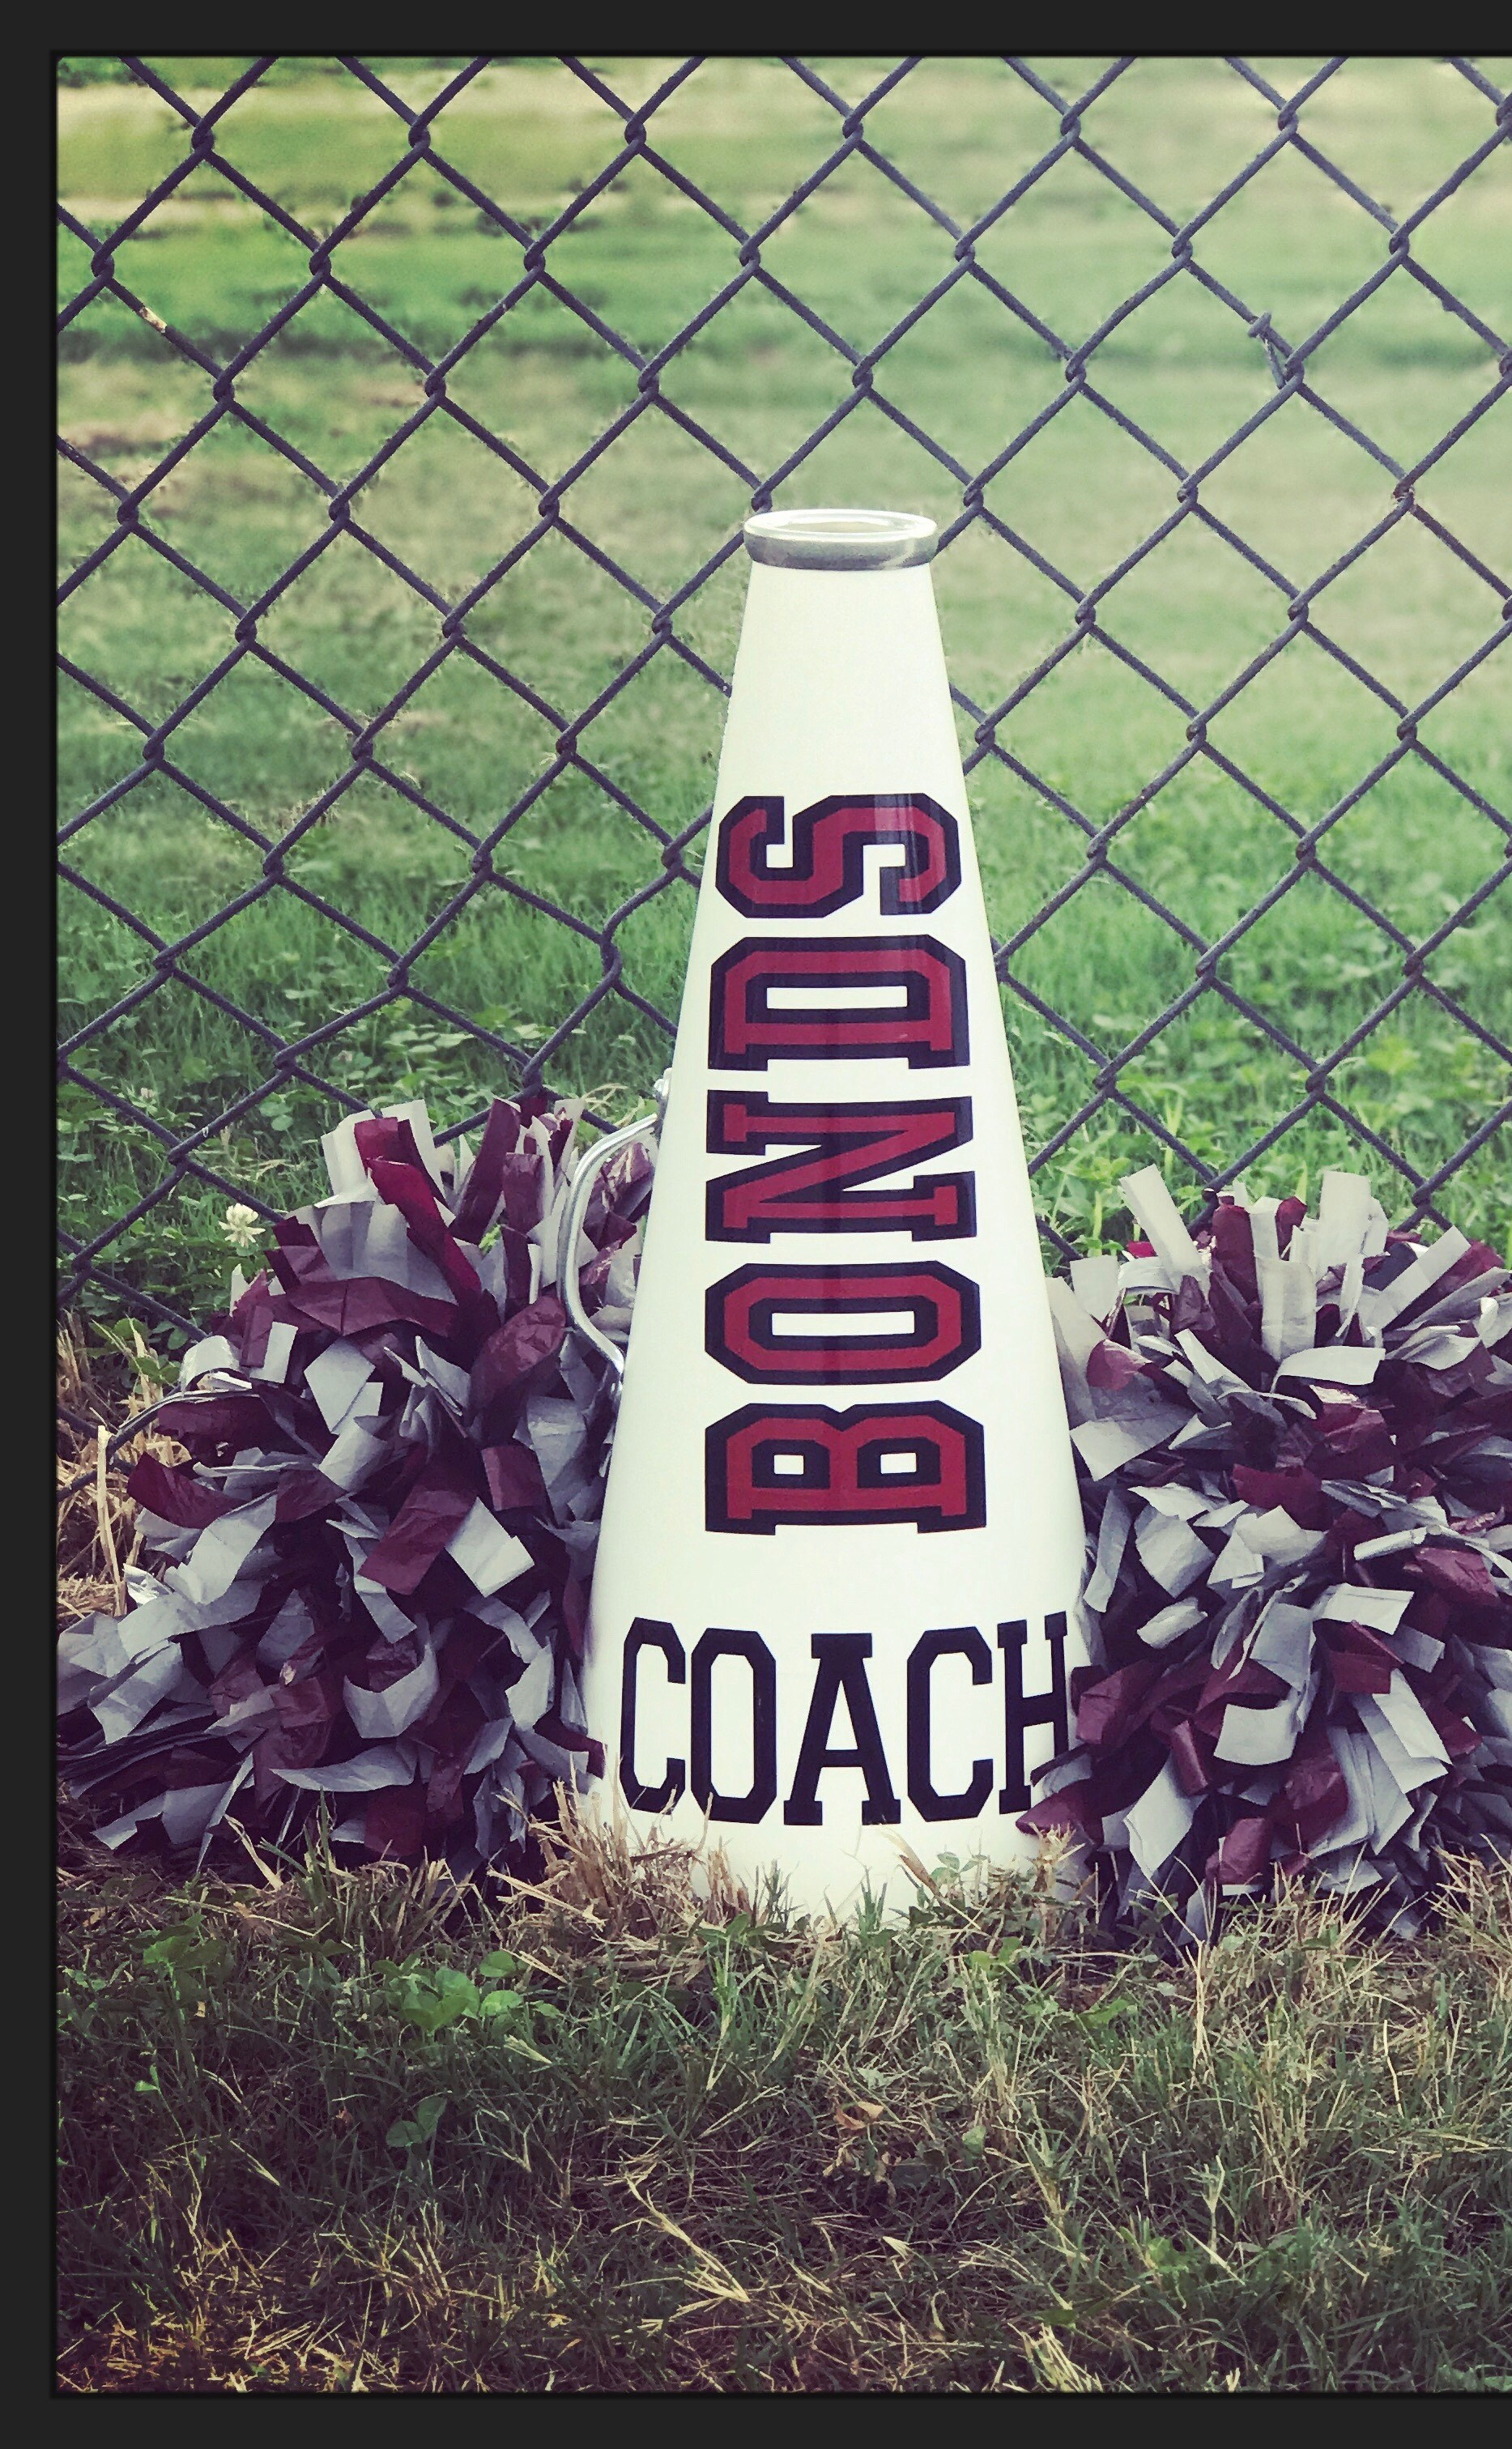 Coach Bonds